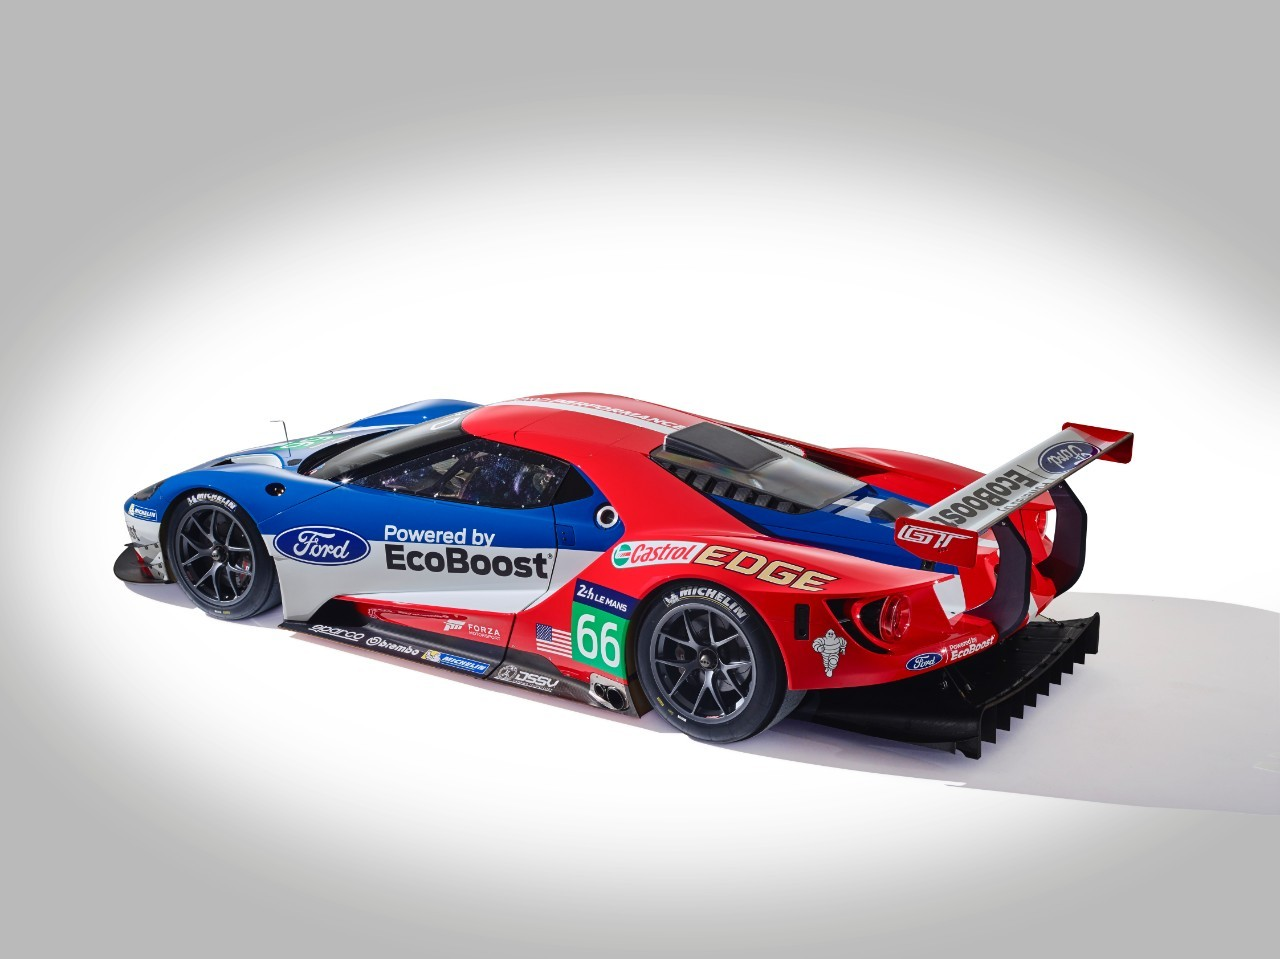 ford to race ecoboost powered gt supercar at le mans onallcylinders. Black Bedroom Furniture Sets. Home Design Ideas